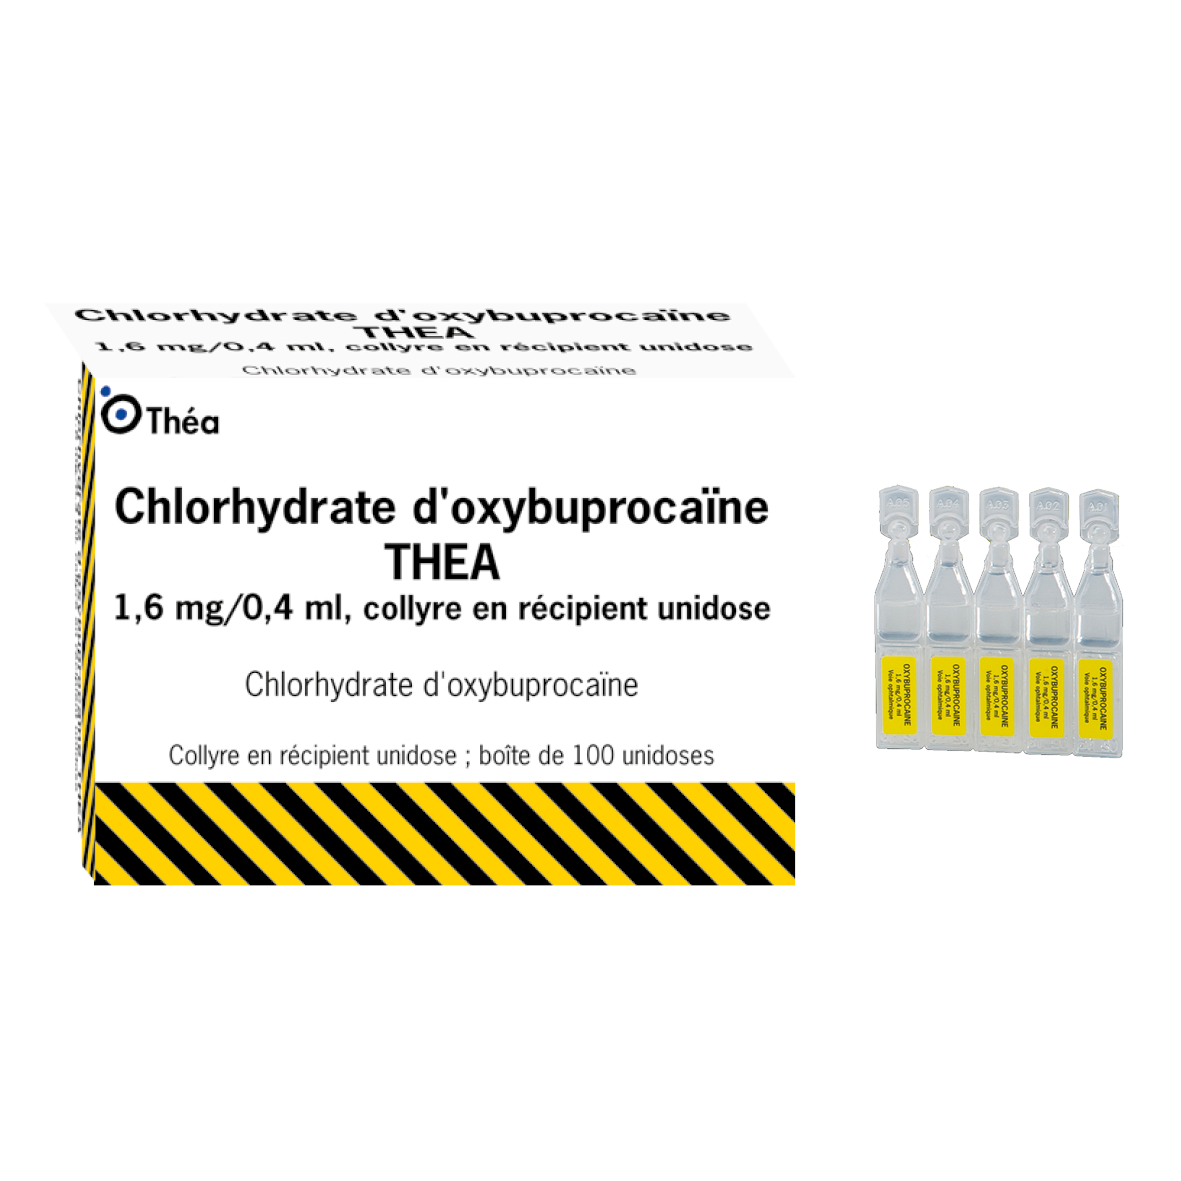 CHLORHYDRATE D